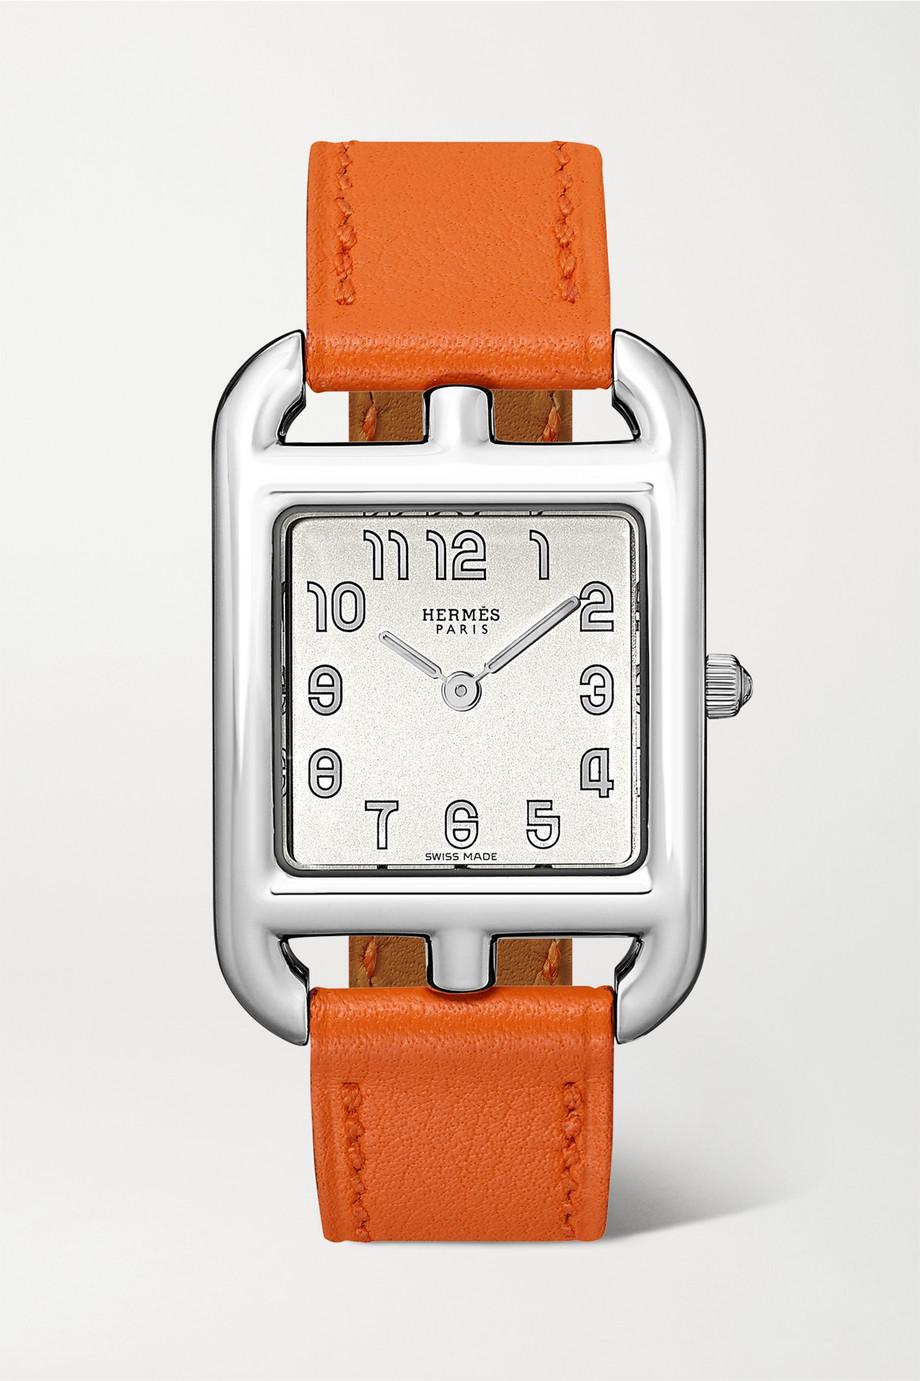 Hermès Timepieces Cape Cod 23 mm kleine Uhr aus Edelstahl mit Lederarmband